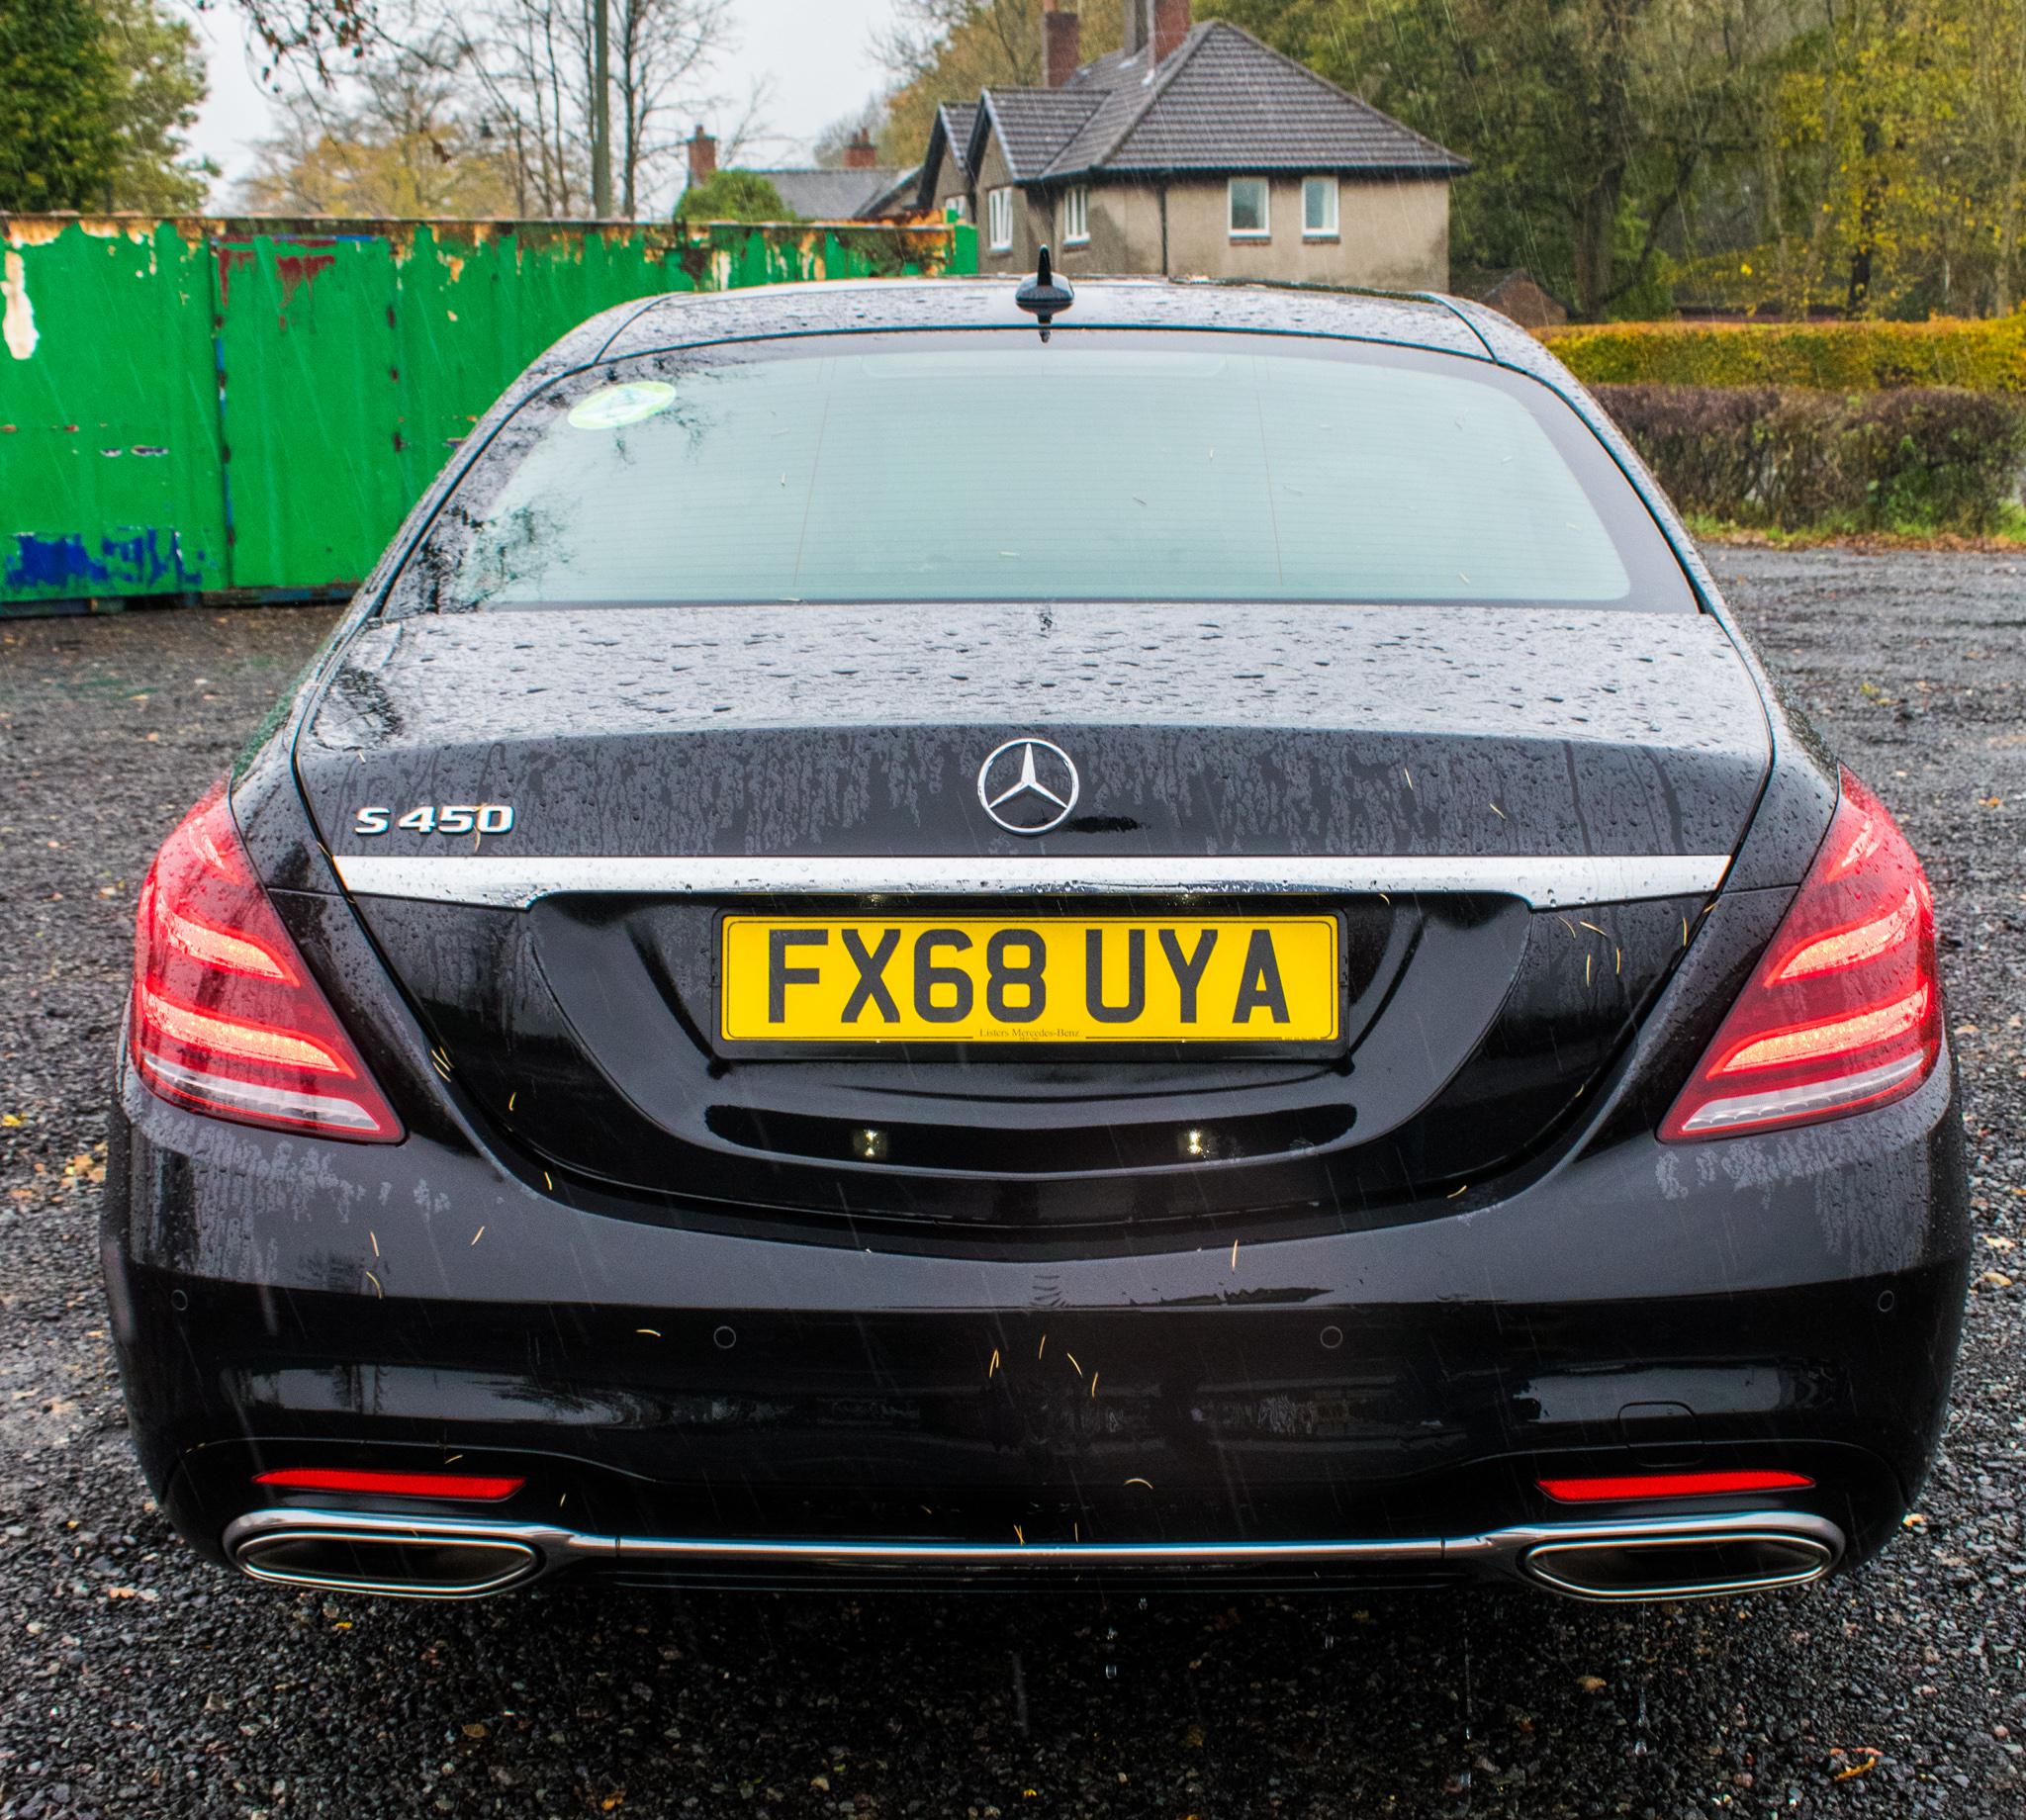 Mercedes Benz S450 L AMG Line Executive auto petrol 4 door saloon car Registration Number: FX68 - Image 6 of 30